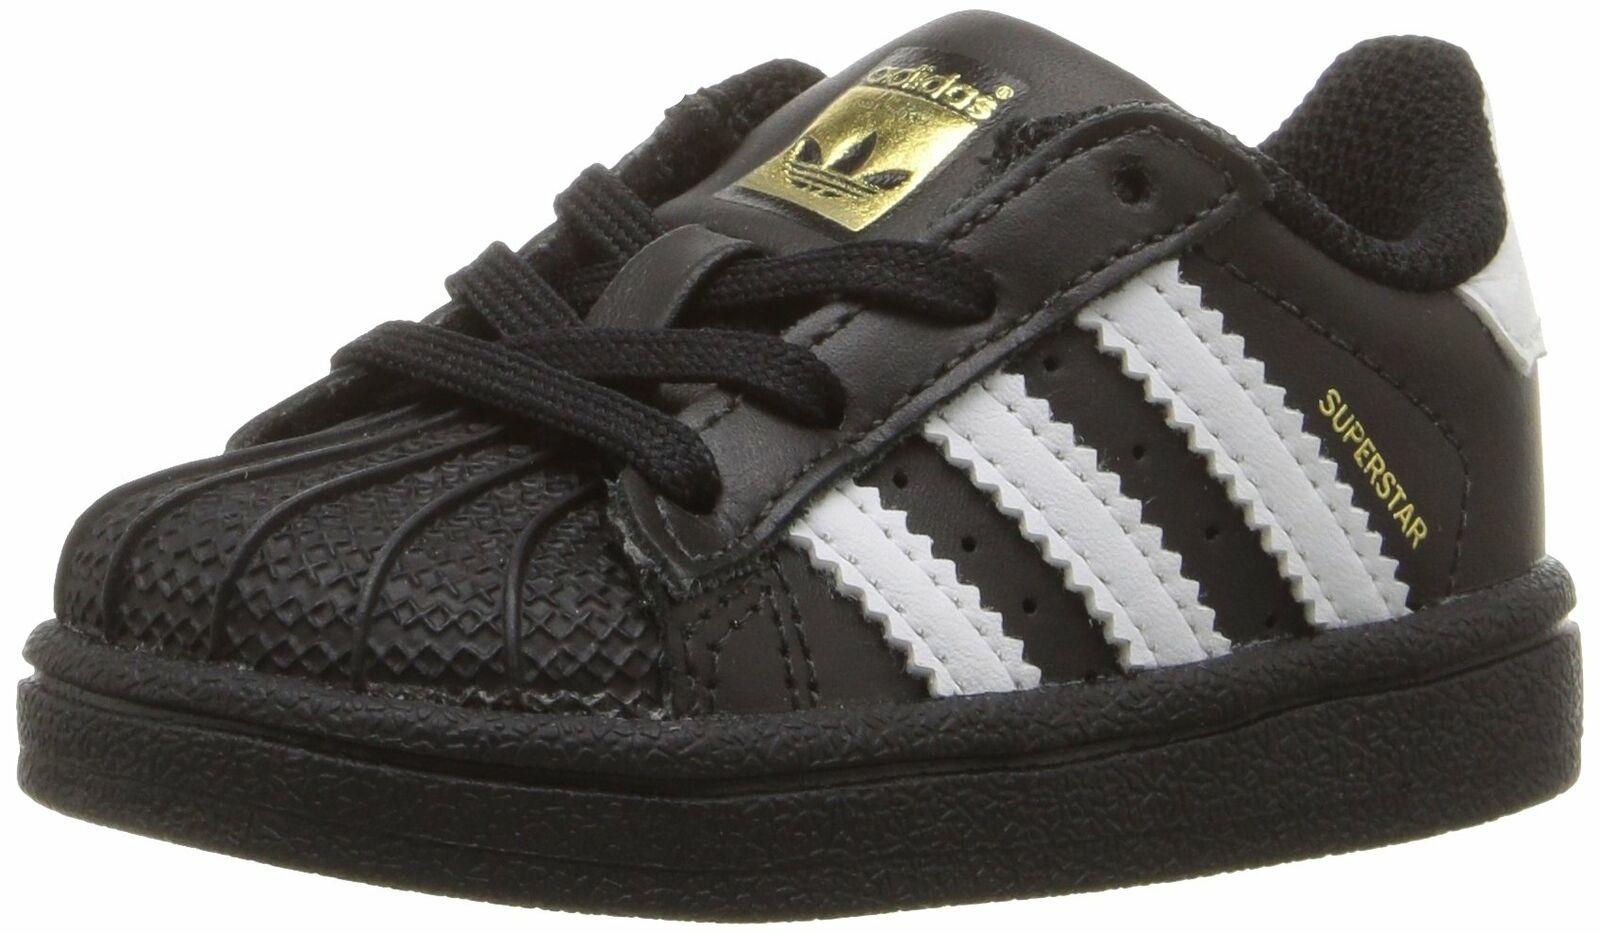 Adidas BB9078: Originals Black/White/White Baby Superstar Toddler Sneakers